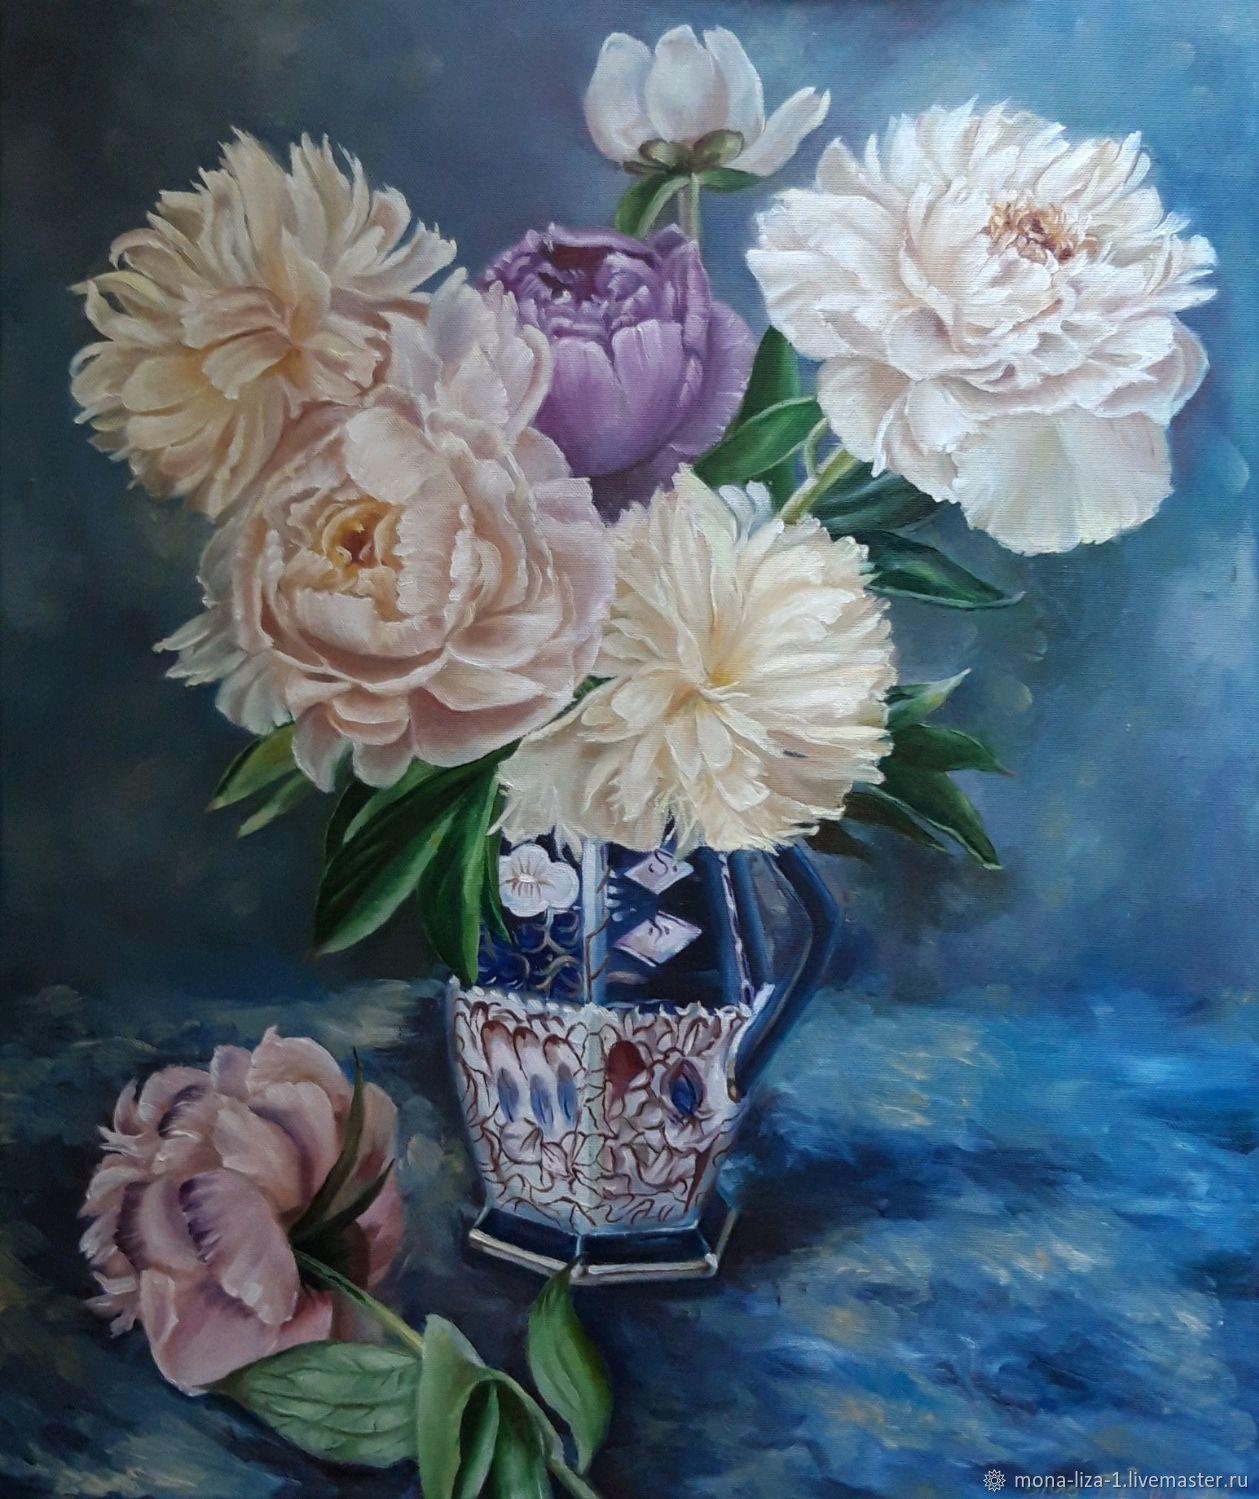 "Картина пионы"" Пионы в вазе"" картина с цветами. Масло, Картины, Анапа,  Фото №1"